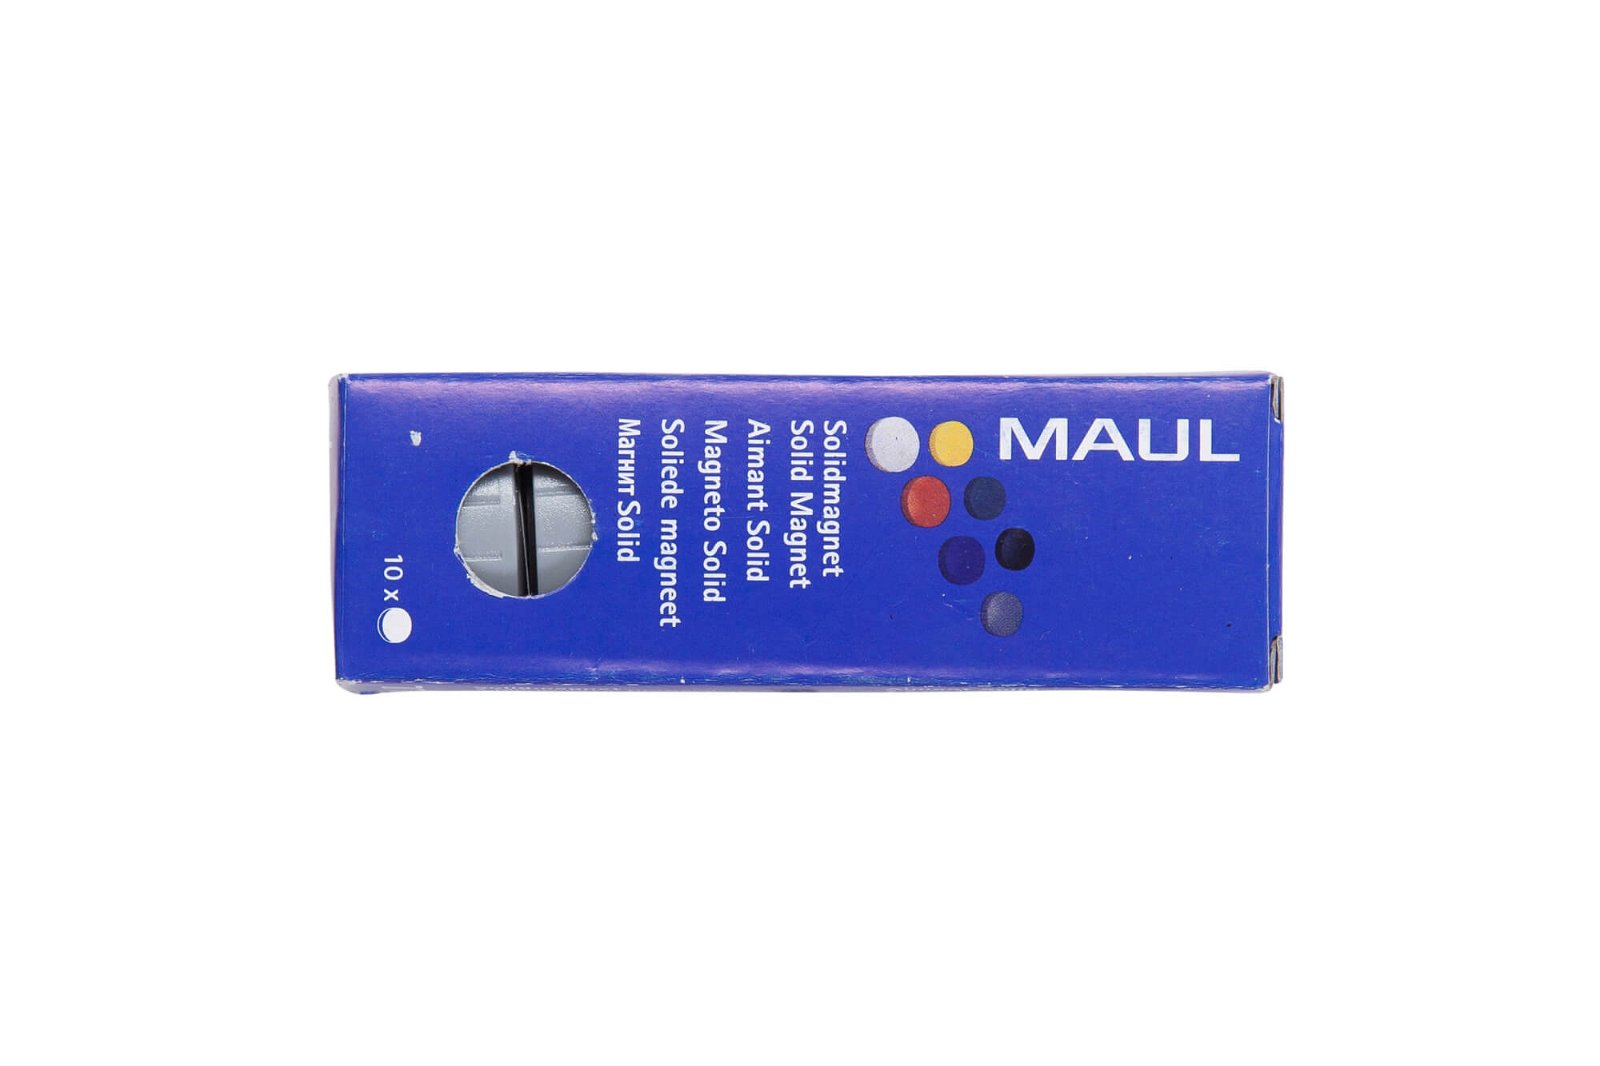 Magnet MAULsolid Ø 32 mm, 0,8 kg Haftkraft, 10 St./Ktn., grau